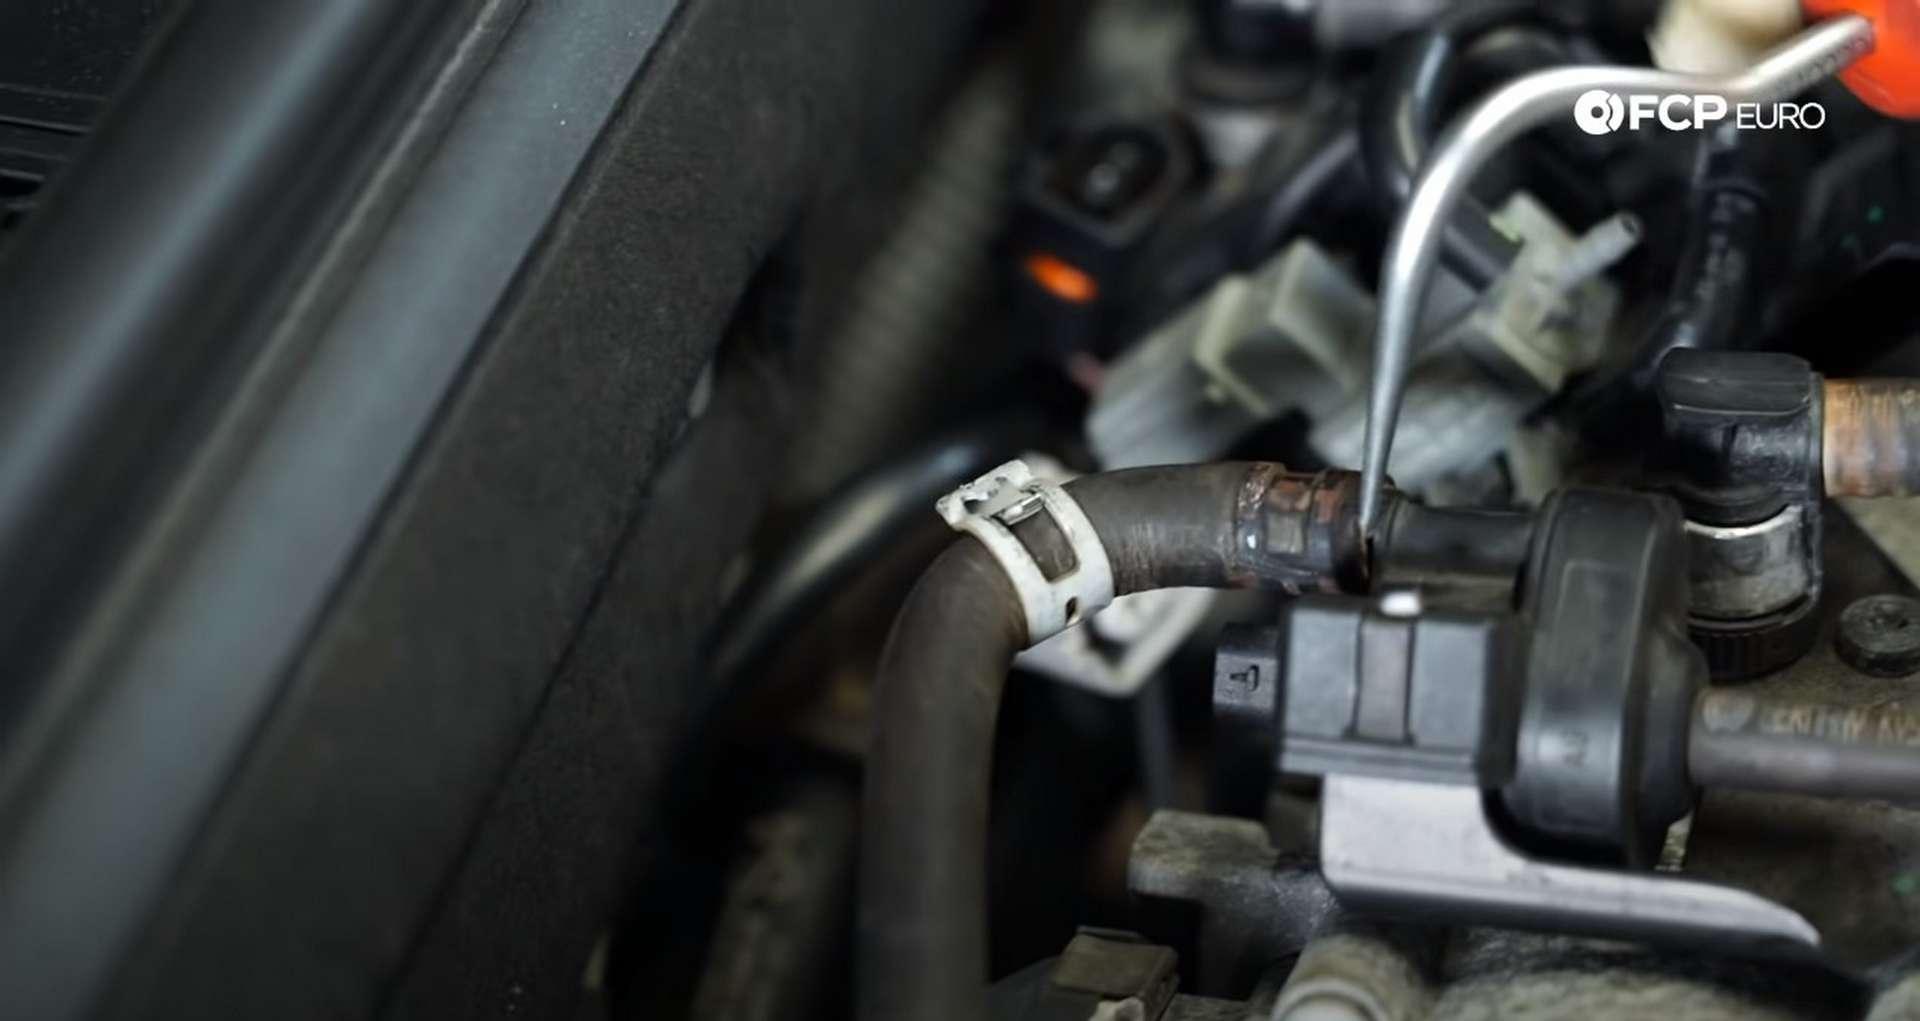 DIY Audi 3.0t Walnut Blasting Intake Valves removing evap hose